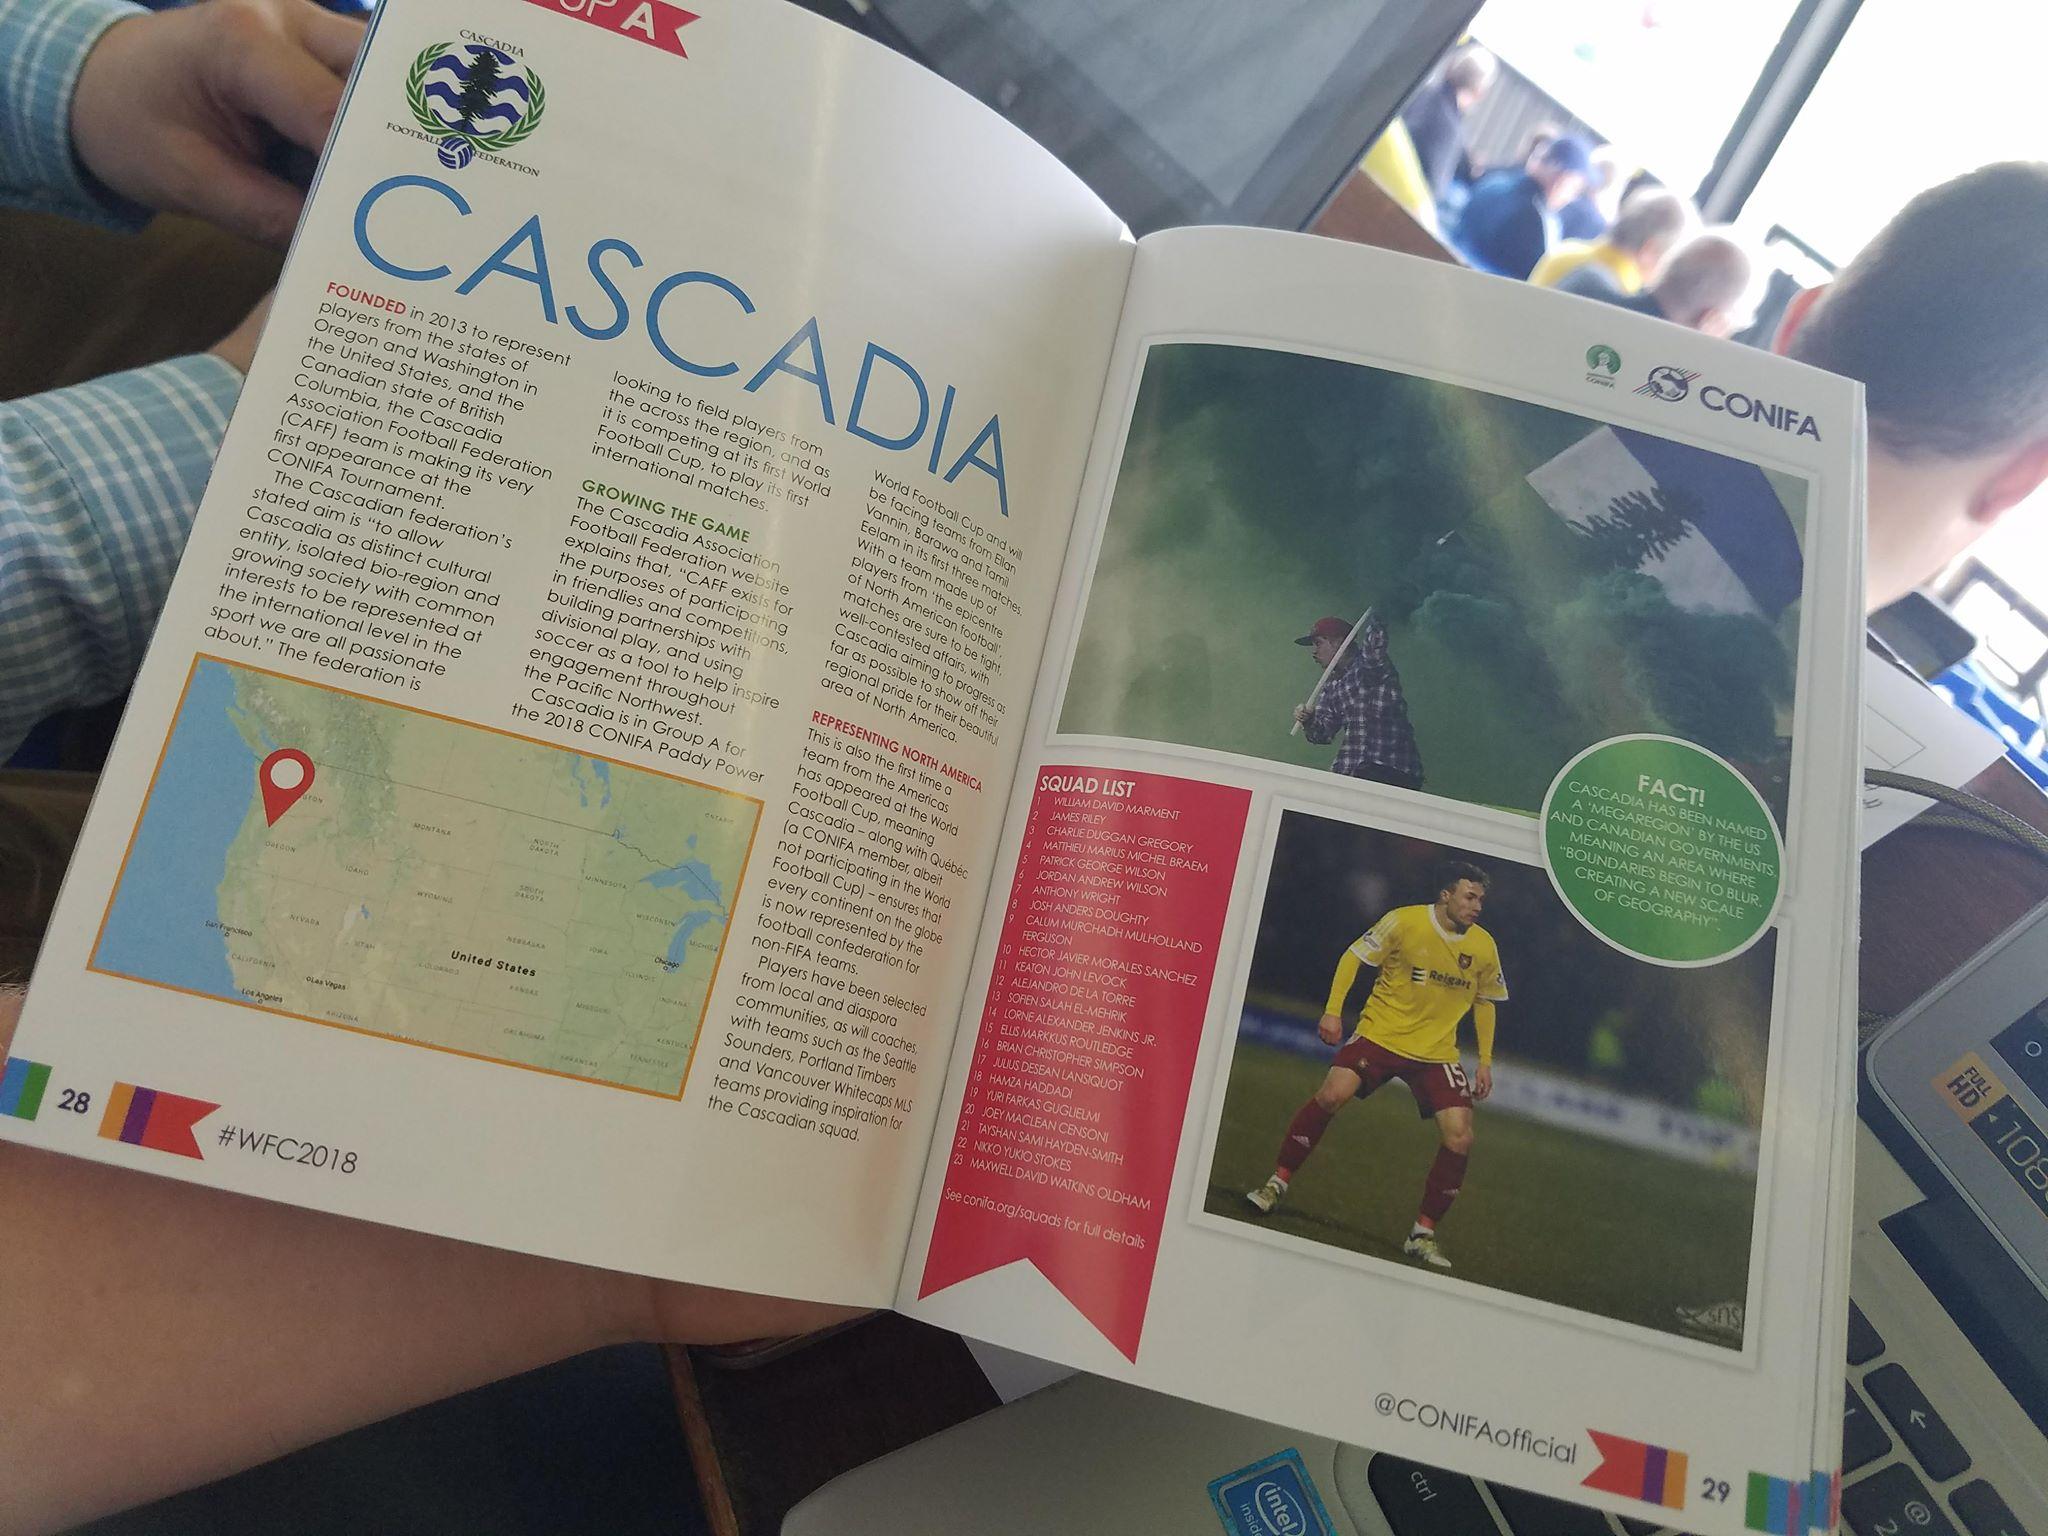 Cascadia Pamphlet.jpg